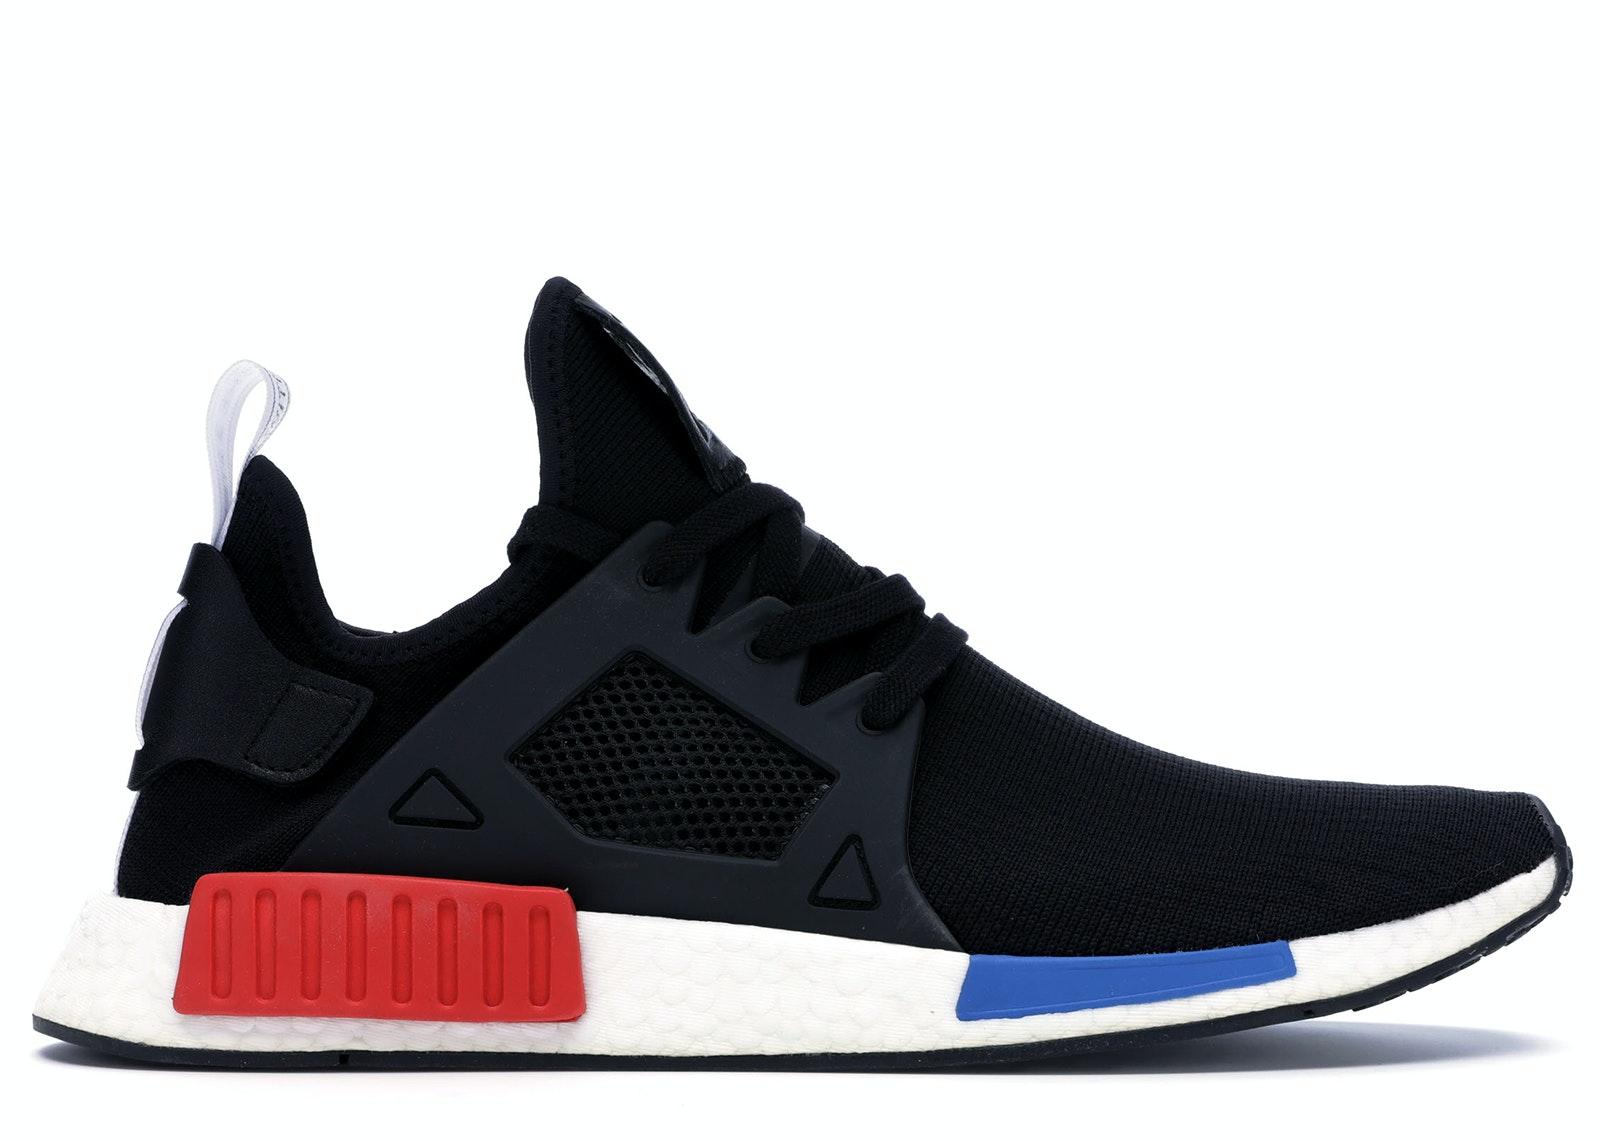 Buy adidas NMD Shoes \u0026 Deadstock Sneakers